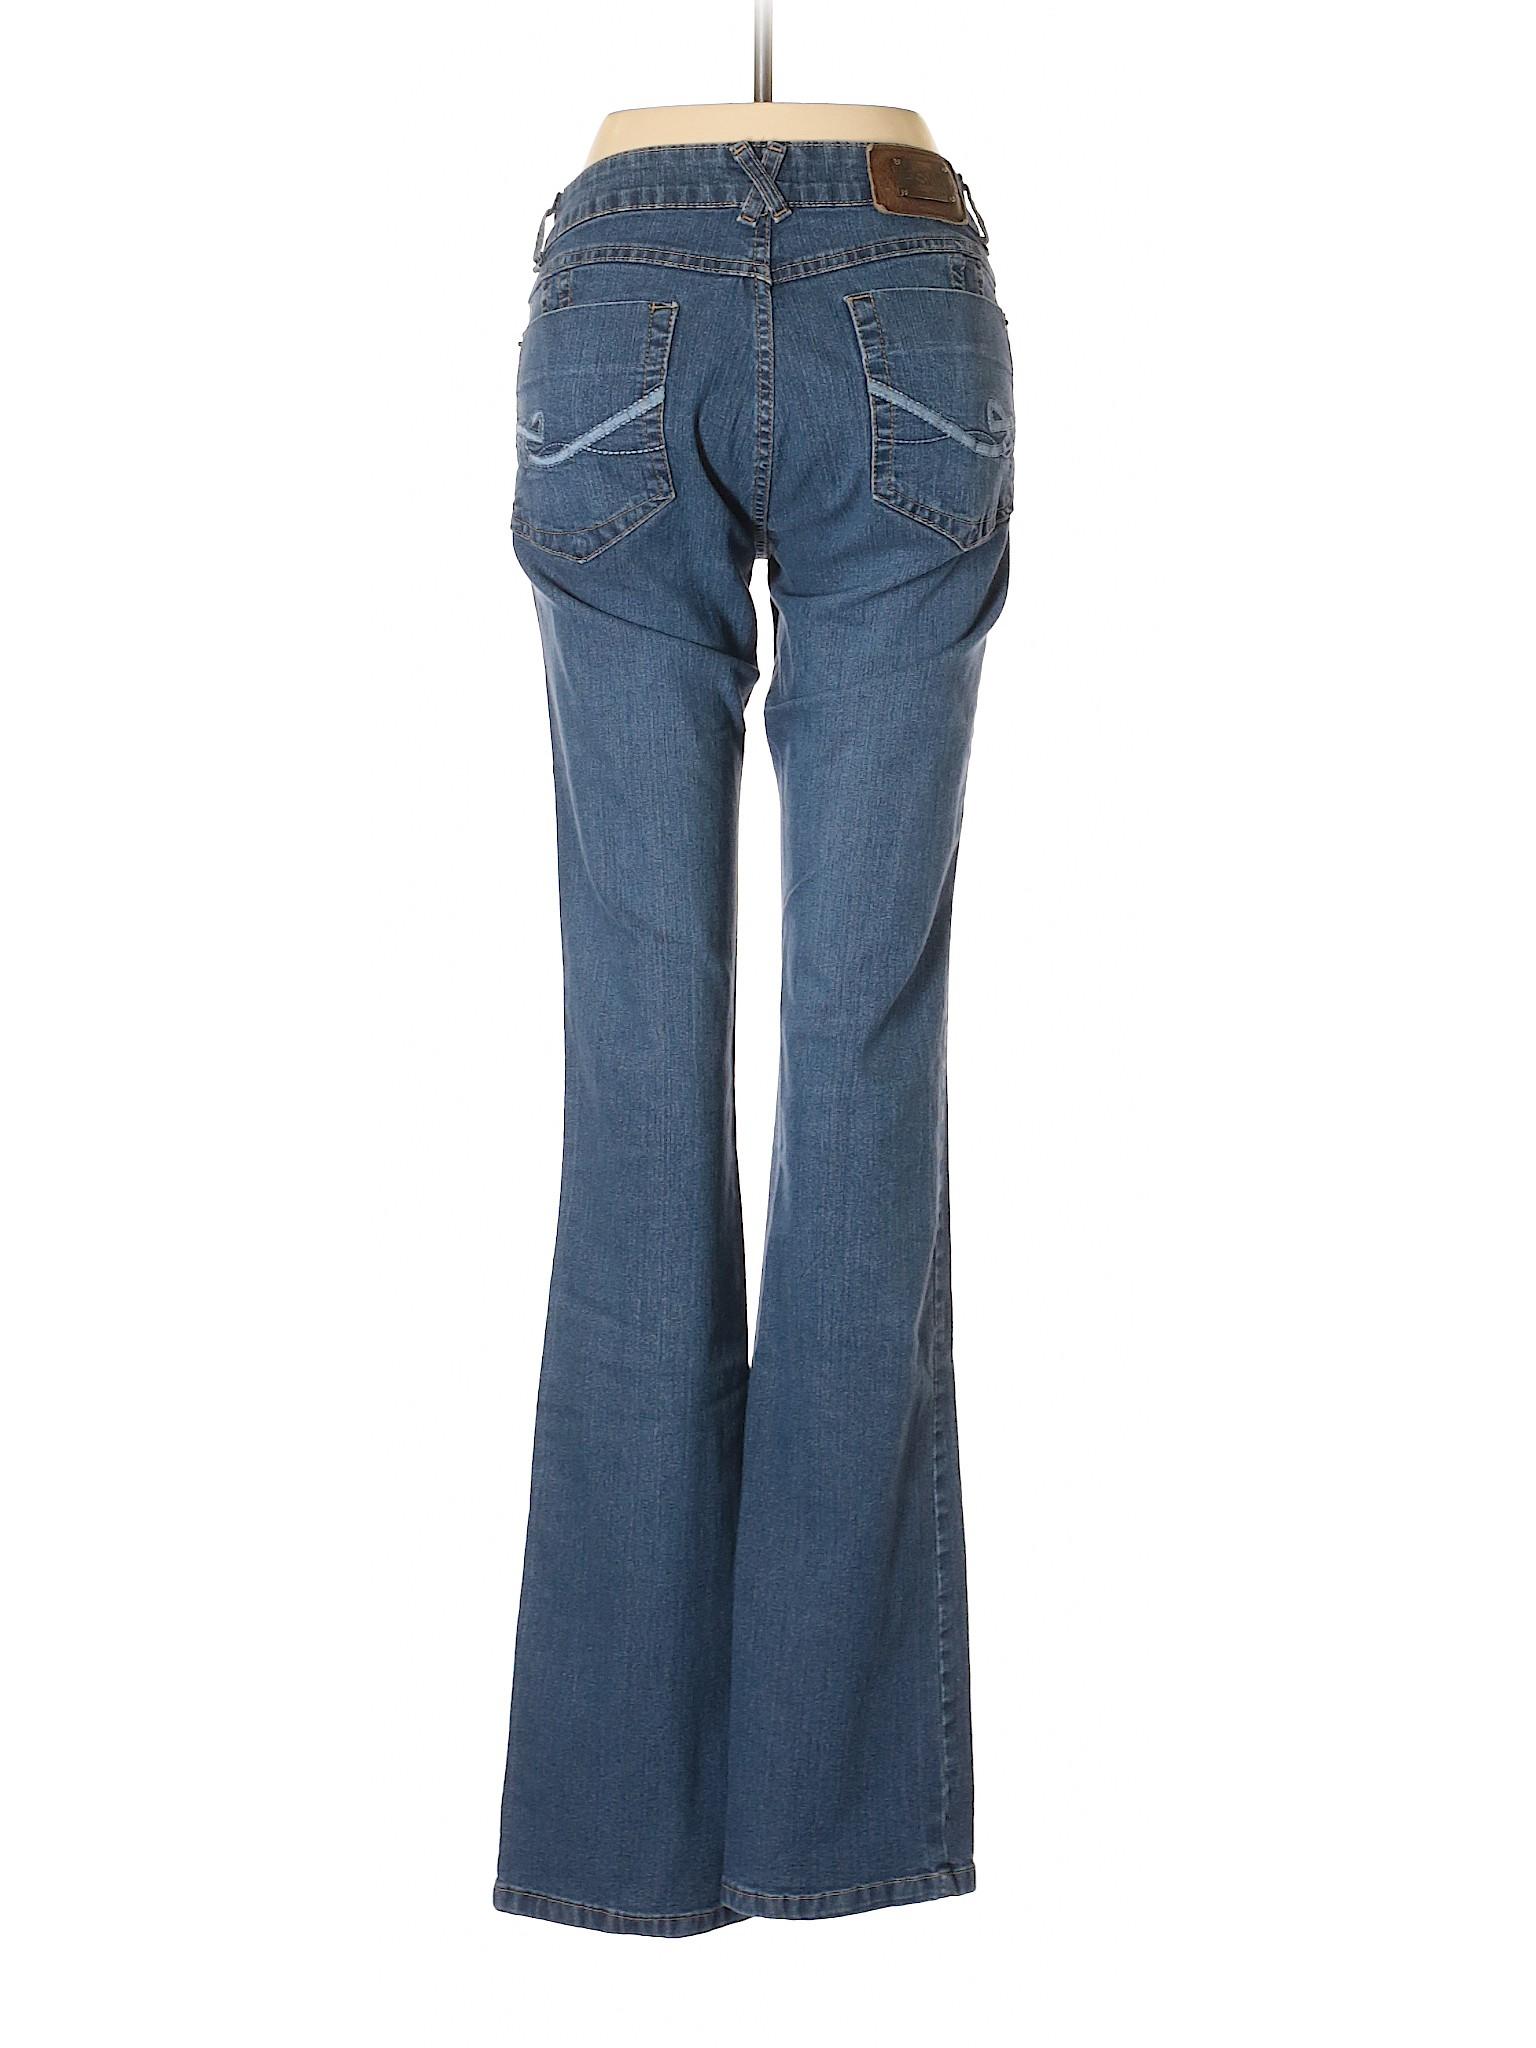 Jeans Jeans Jeans Promotion Promotion Promotion Sawary Sawary Sawary OTndqO7B